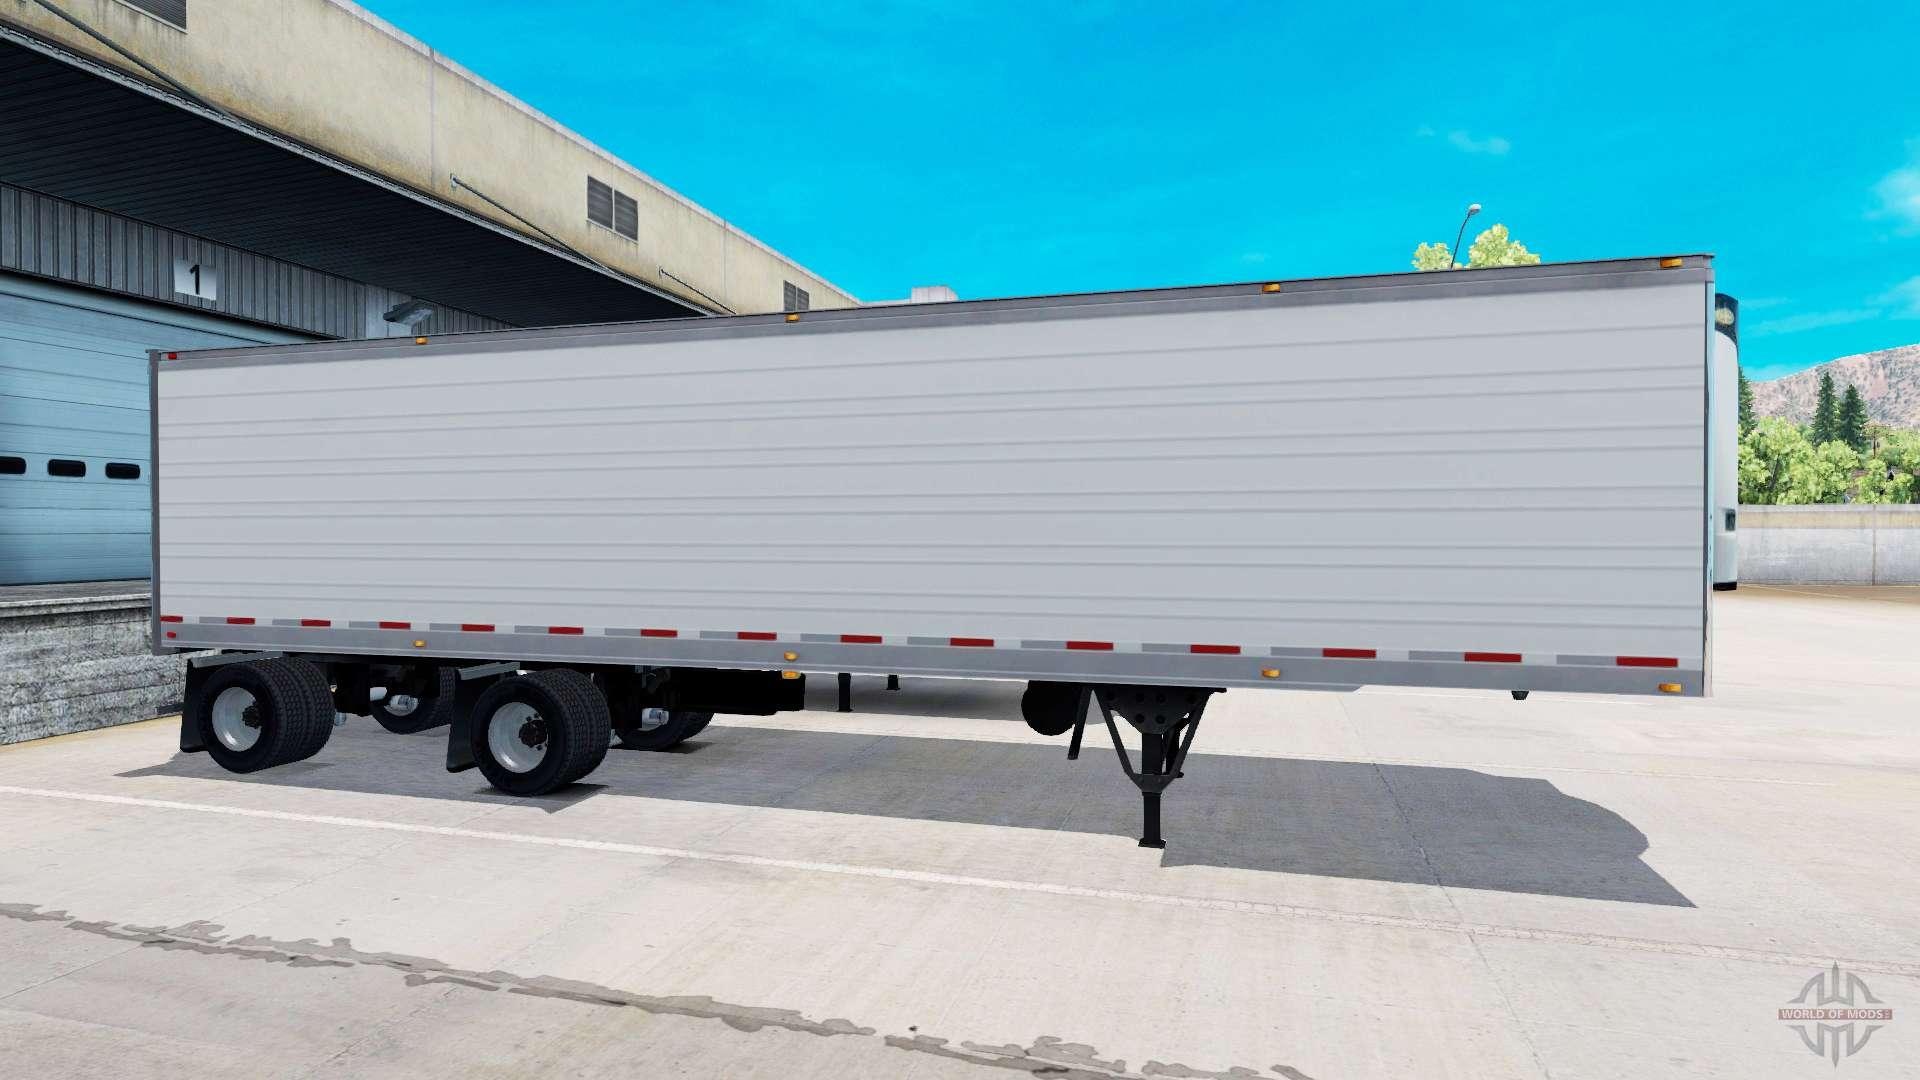 biaxiale frigorifique semi remorque pour american truck simulator. Black Bedroom Furniture Sets. Home Design Ideas